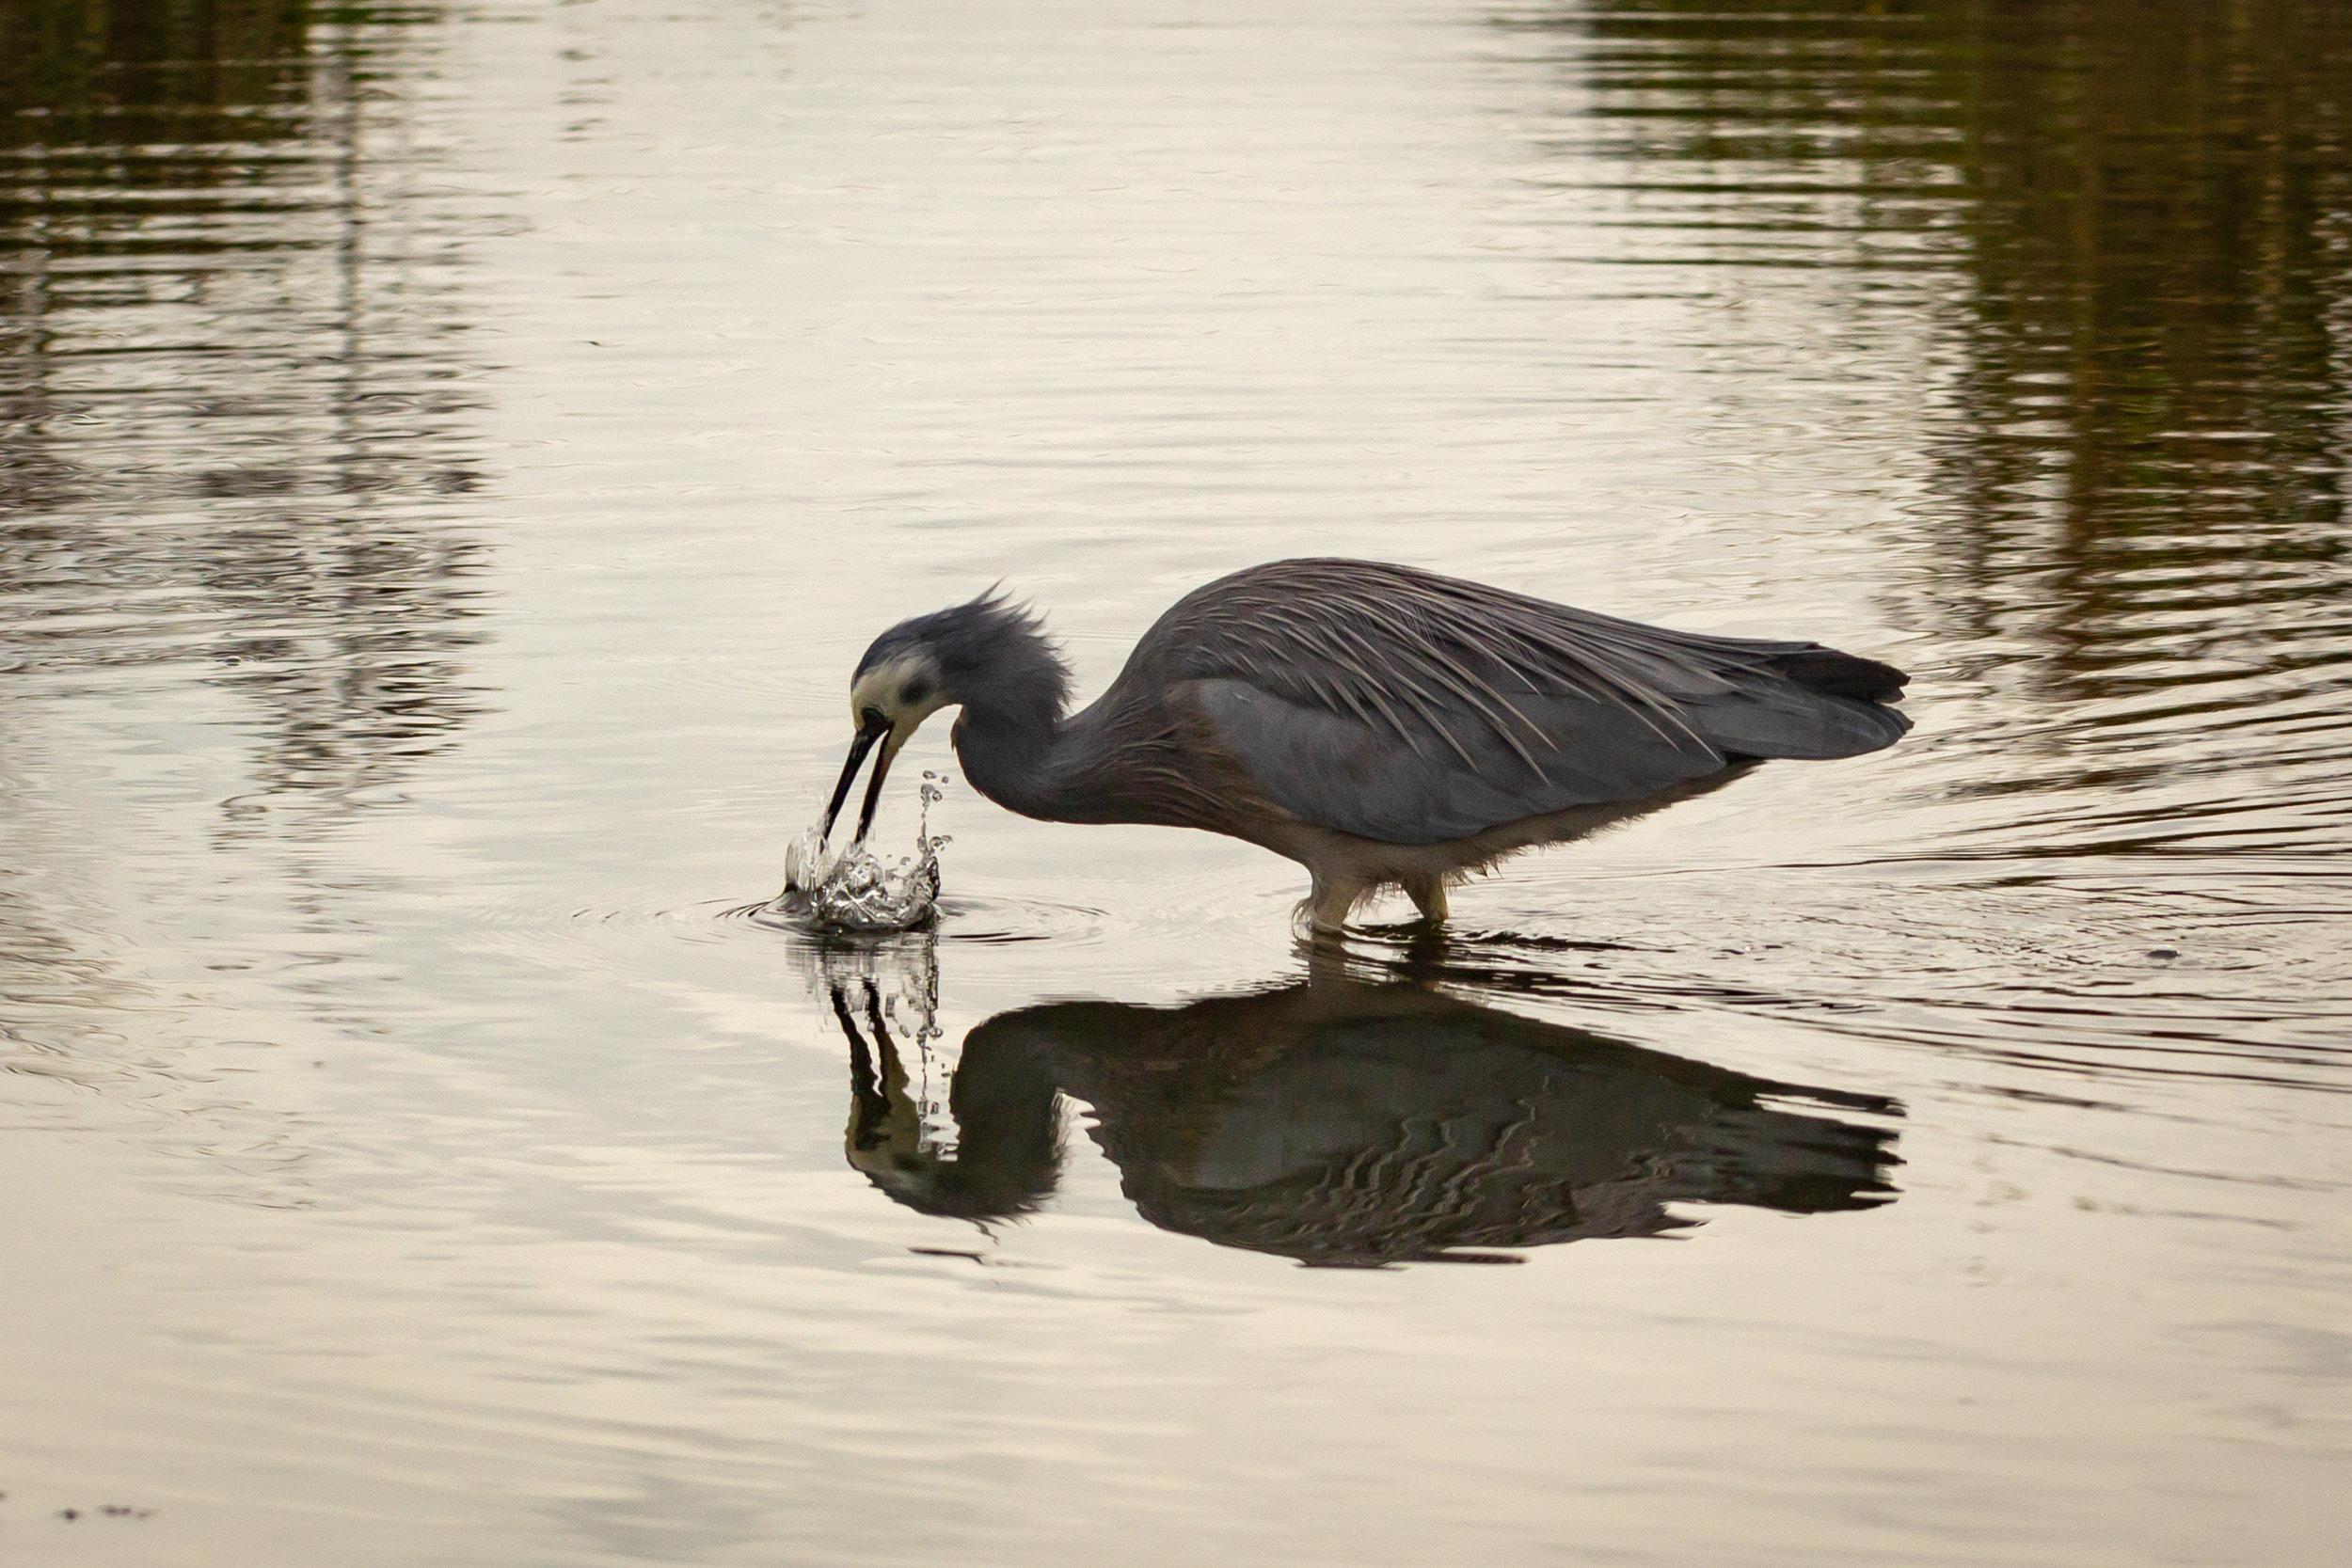 Pukehina Eco Village would create 35 ha of lake and 100 ha of wetlands. Photo credit - Leigh Nicholas.